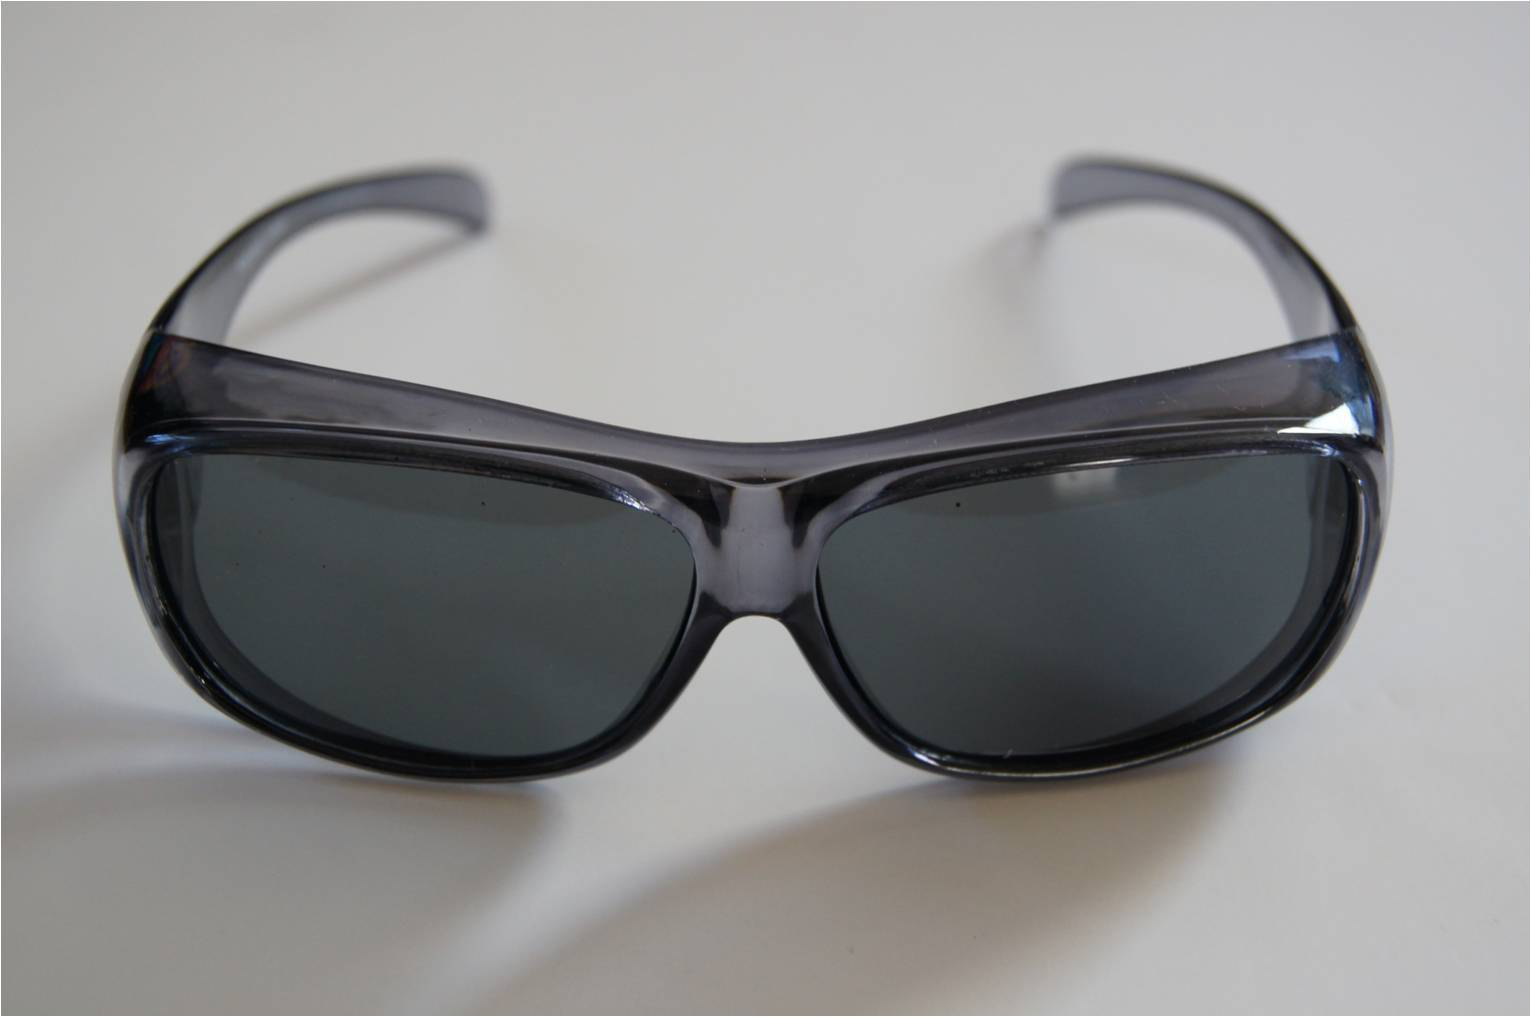 Clear bk polarized sunglasses wear put cover over rx for Prescription fishing sunglasses